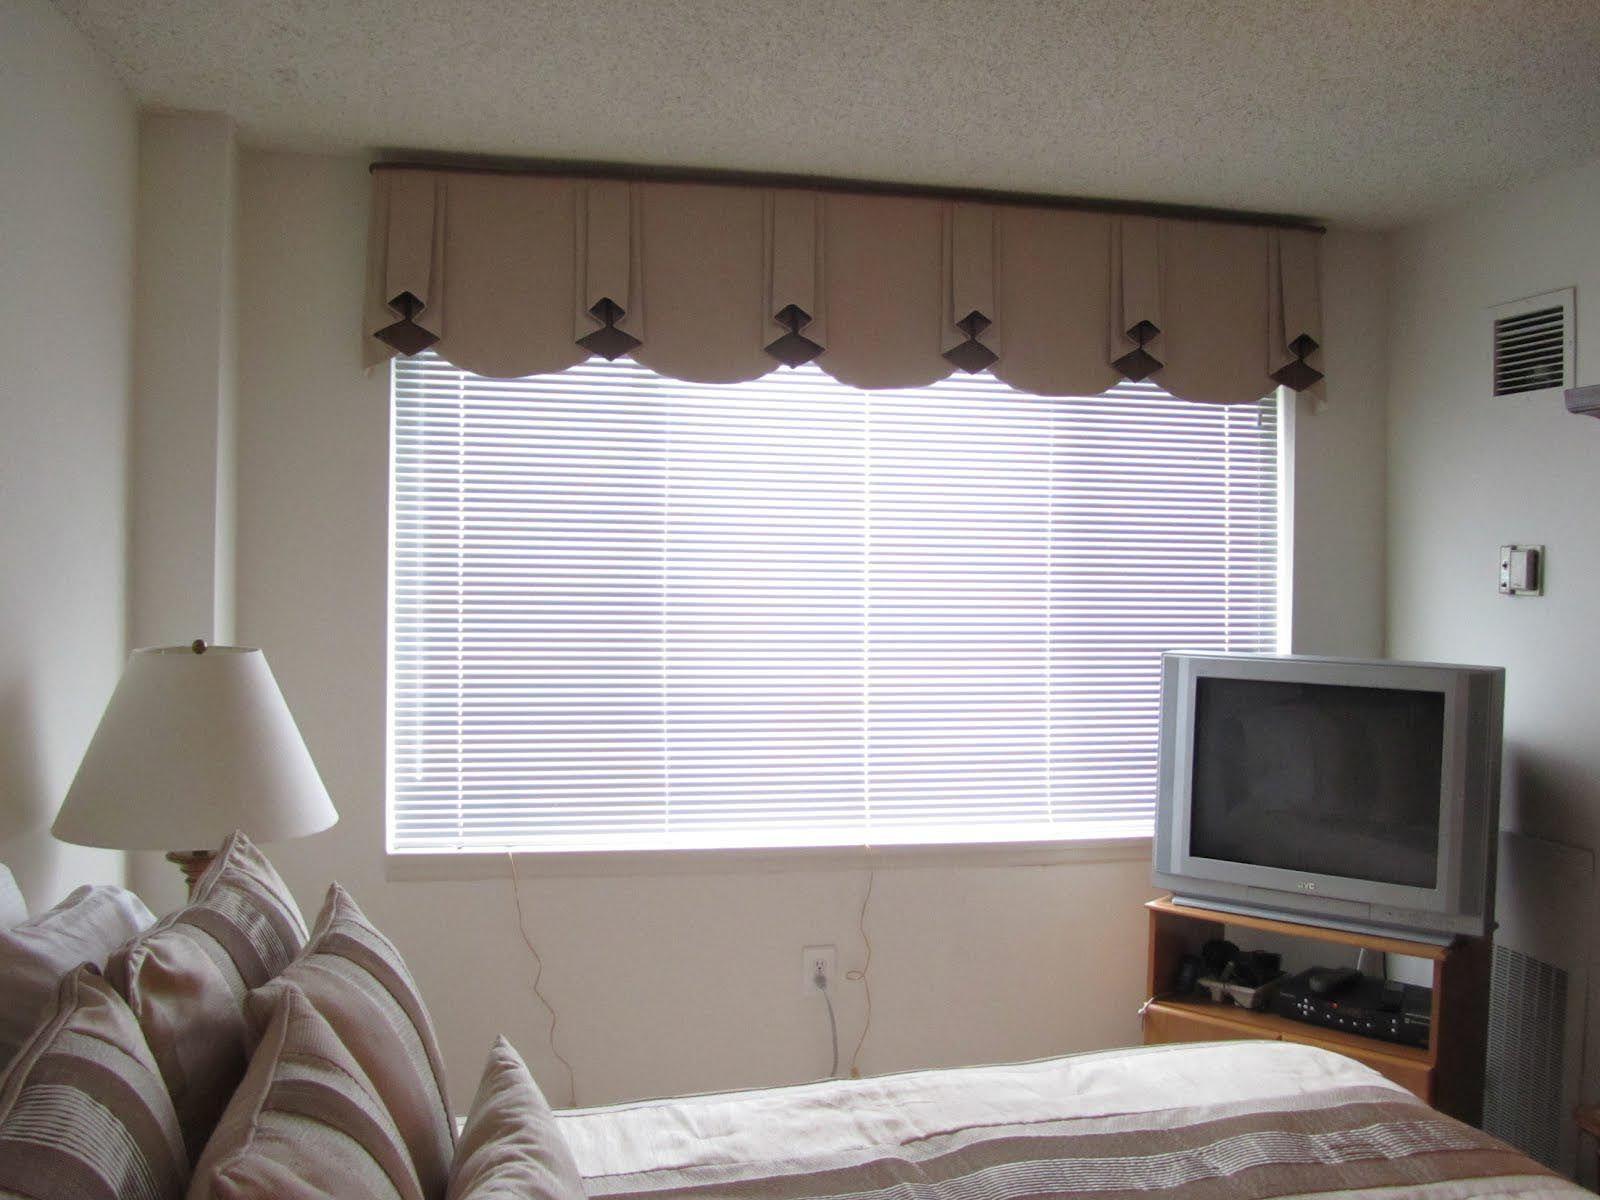 Valances for Bedroom Windows   Modern window coverings, Bedroom ...